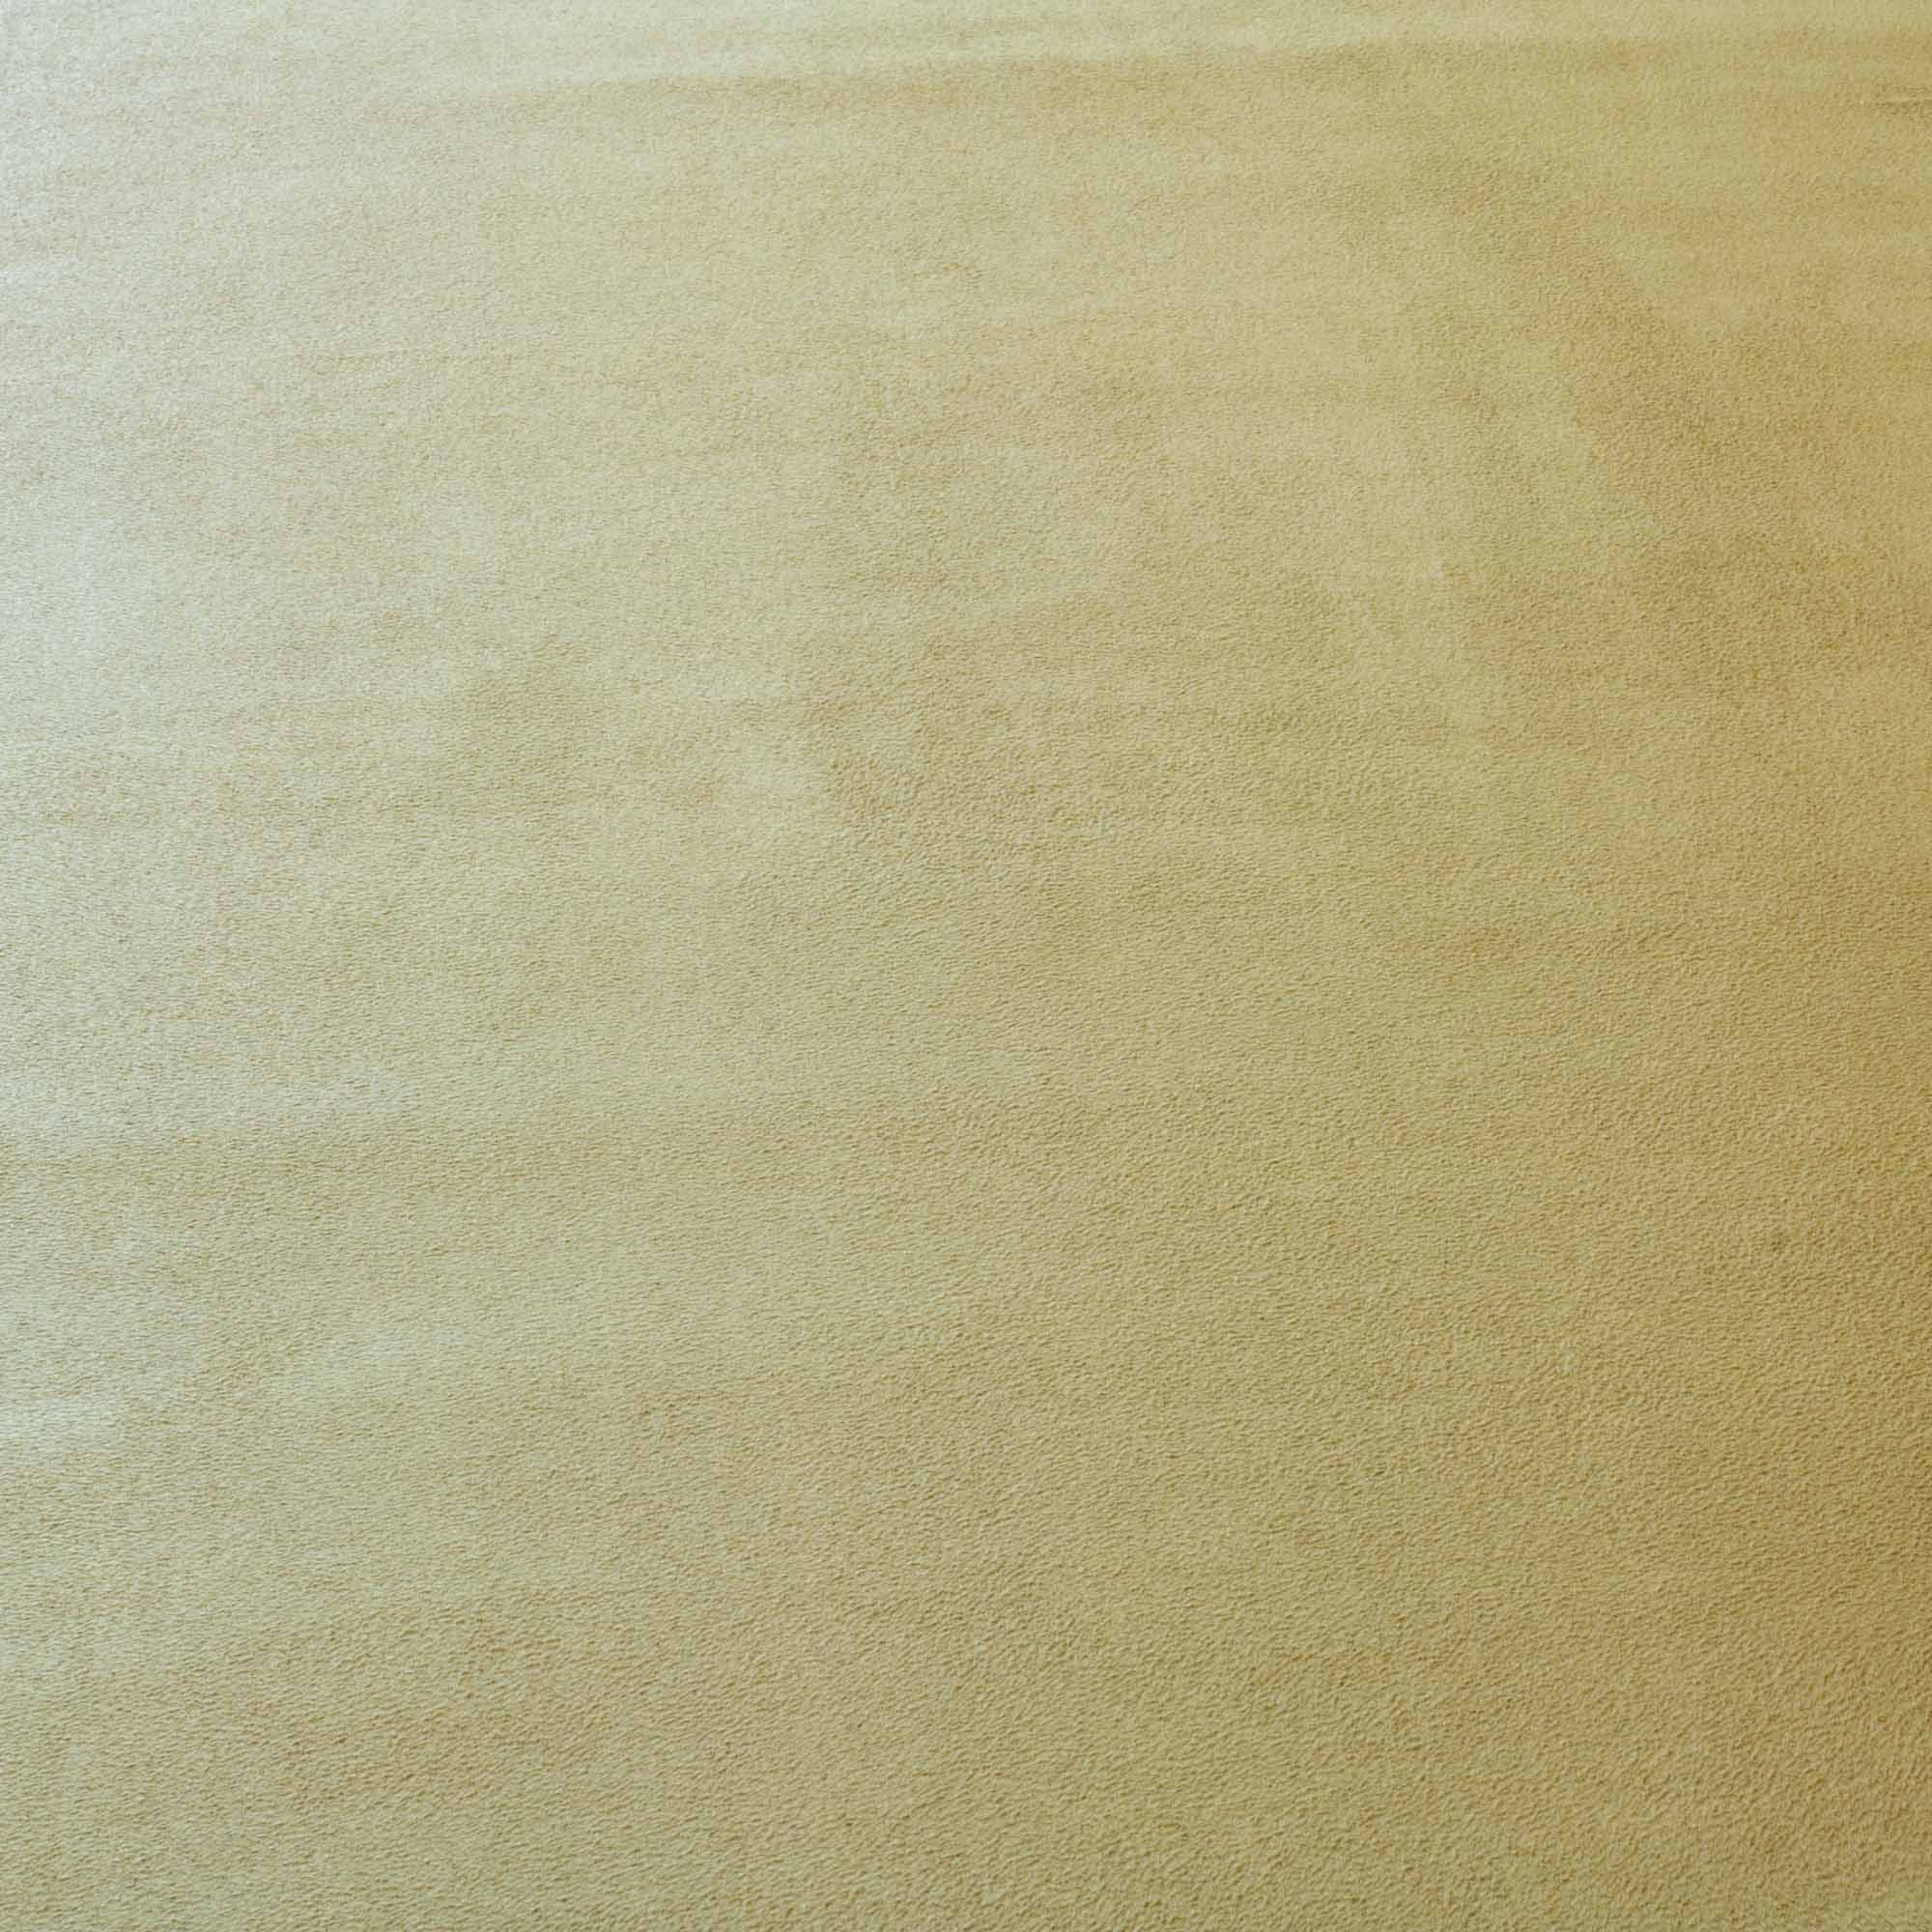 Tecido Camurça Castor 100% Poliester 1,50 m Largura